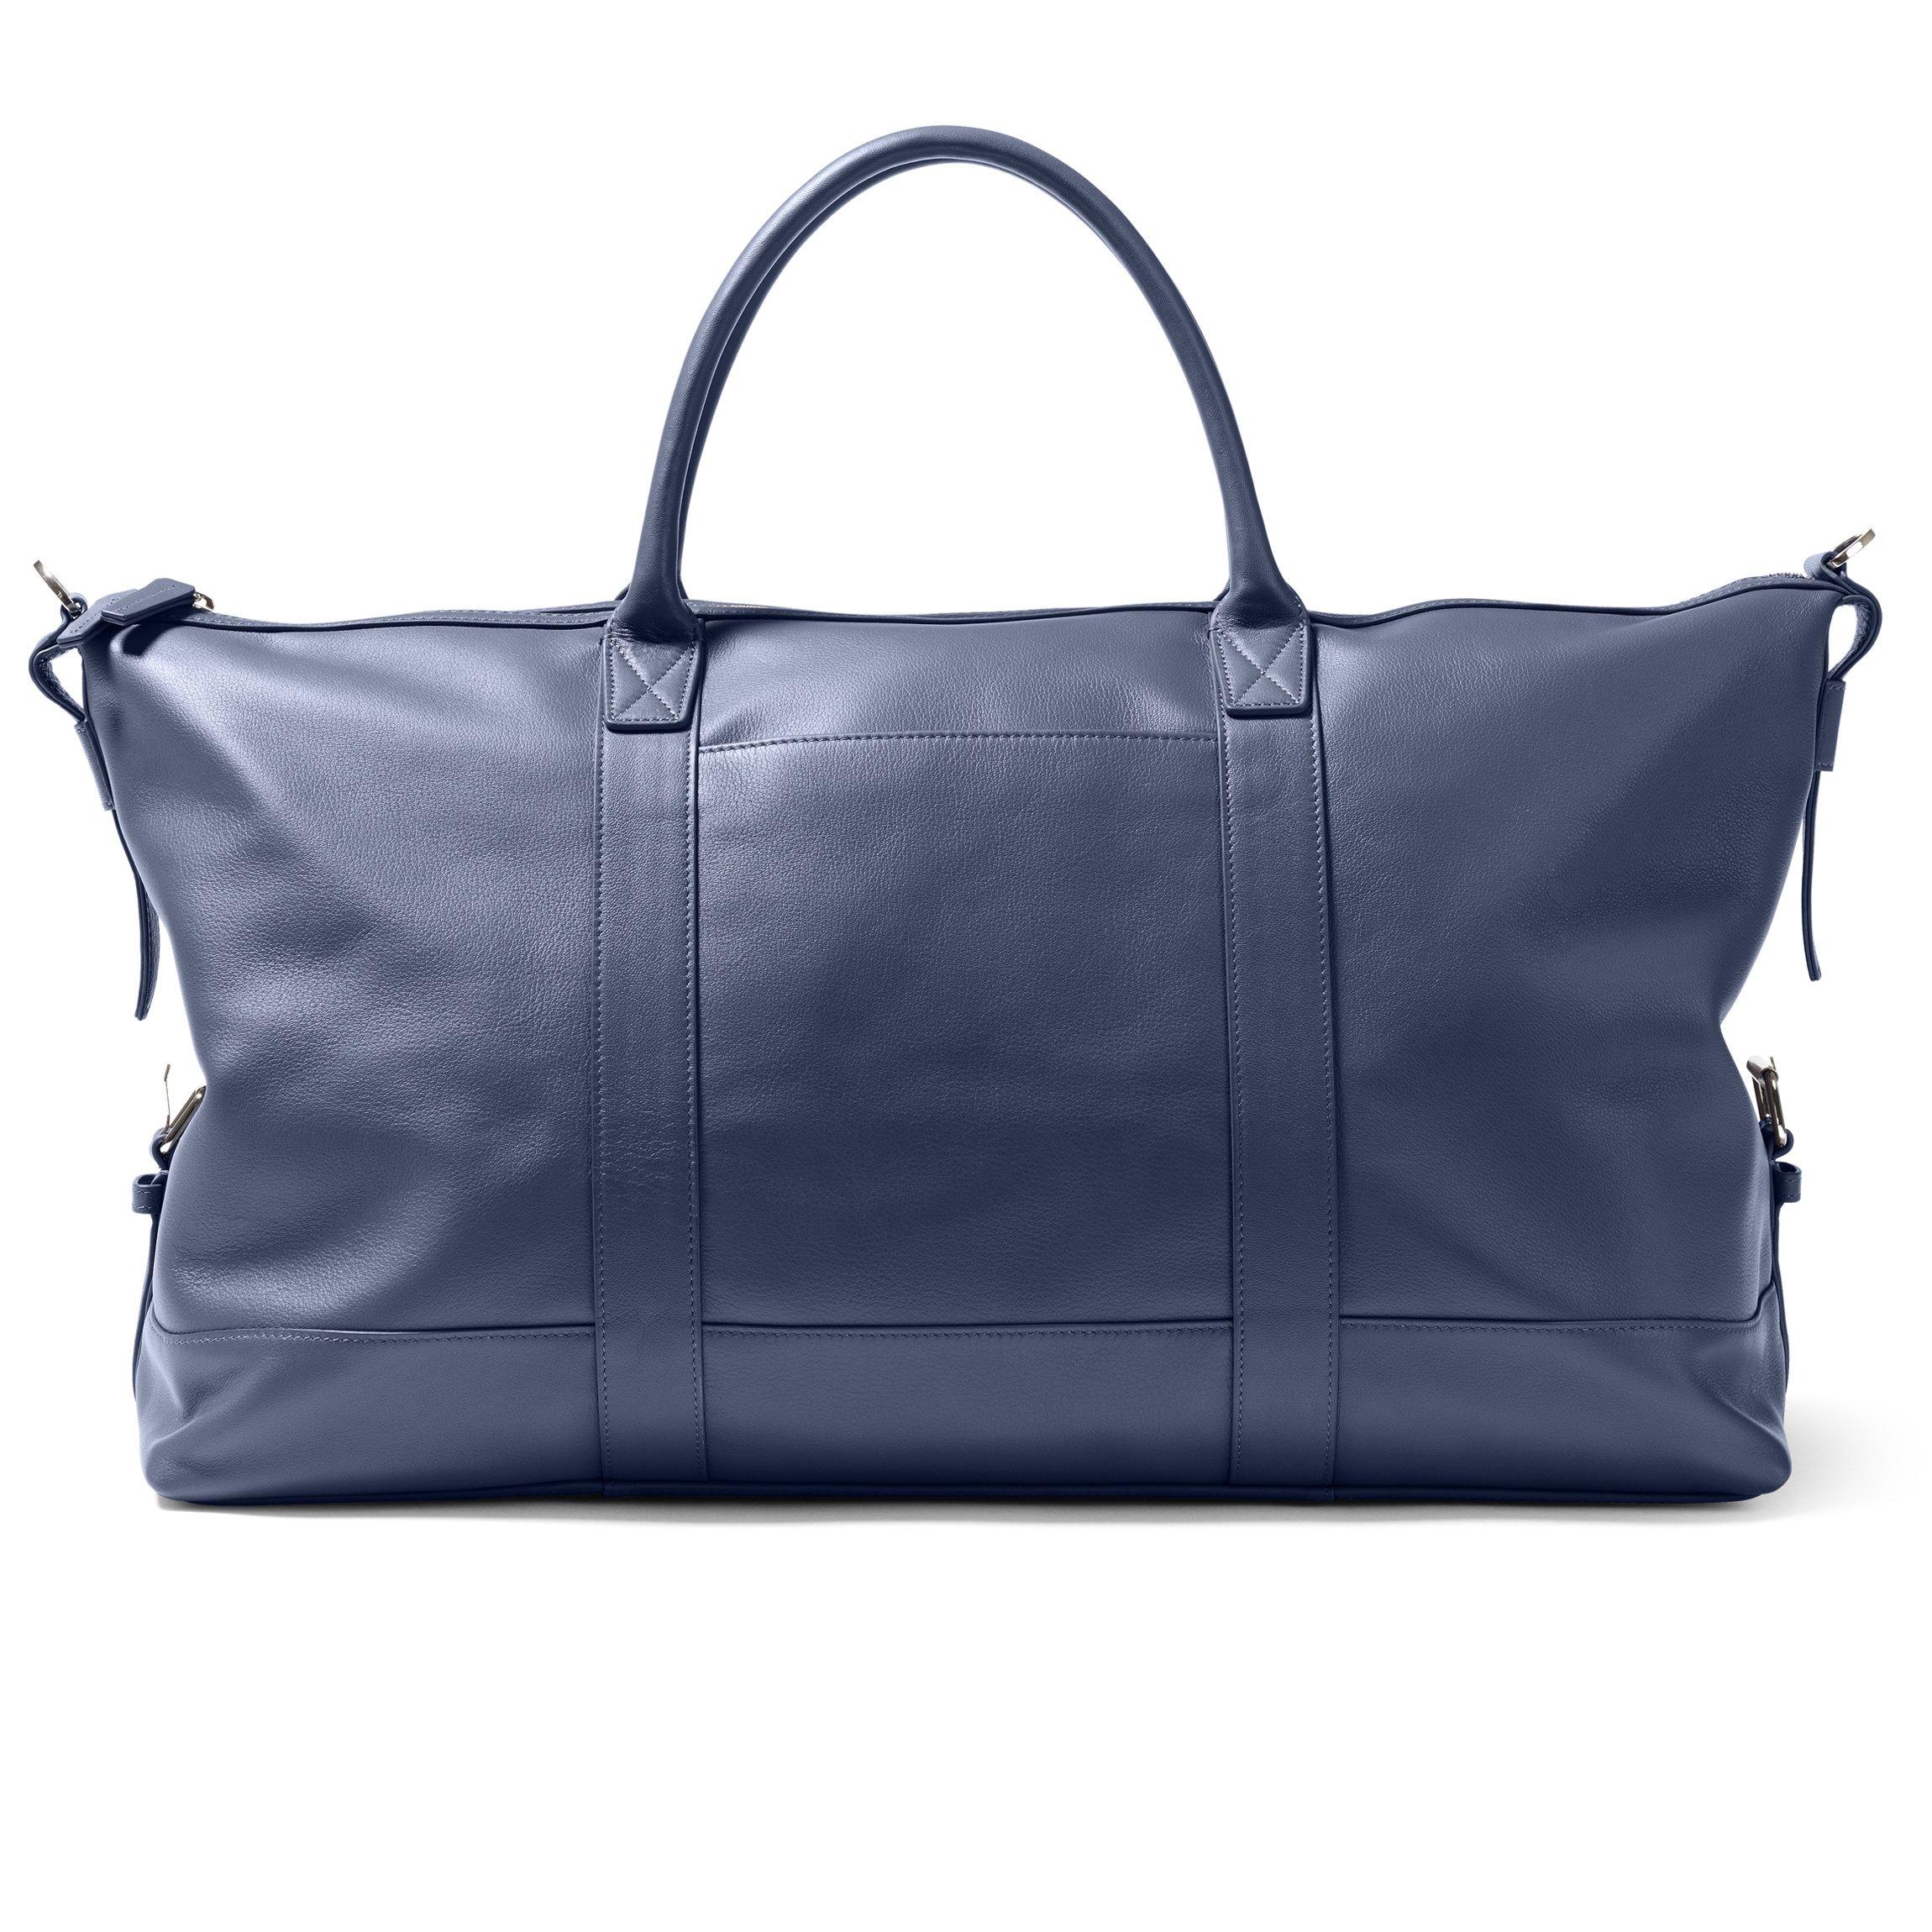 Kessler Medium Duffle - Full Grain Leather Leather - Navy (blue) by Leatherology (Image #5)